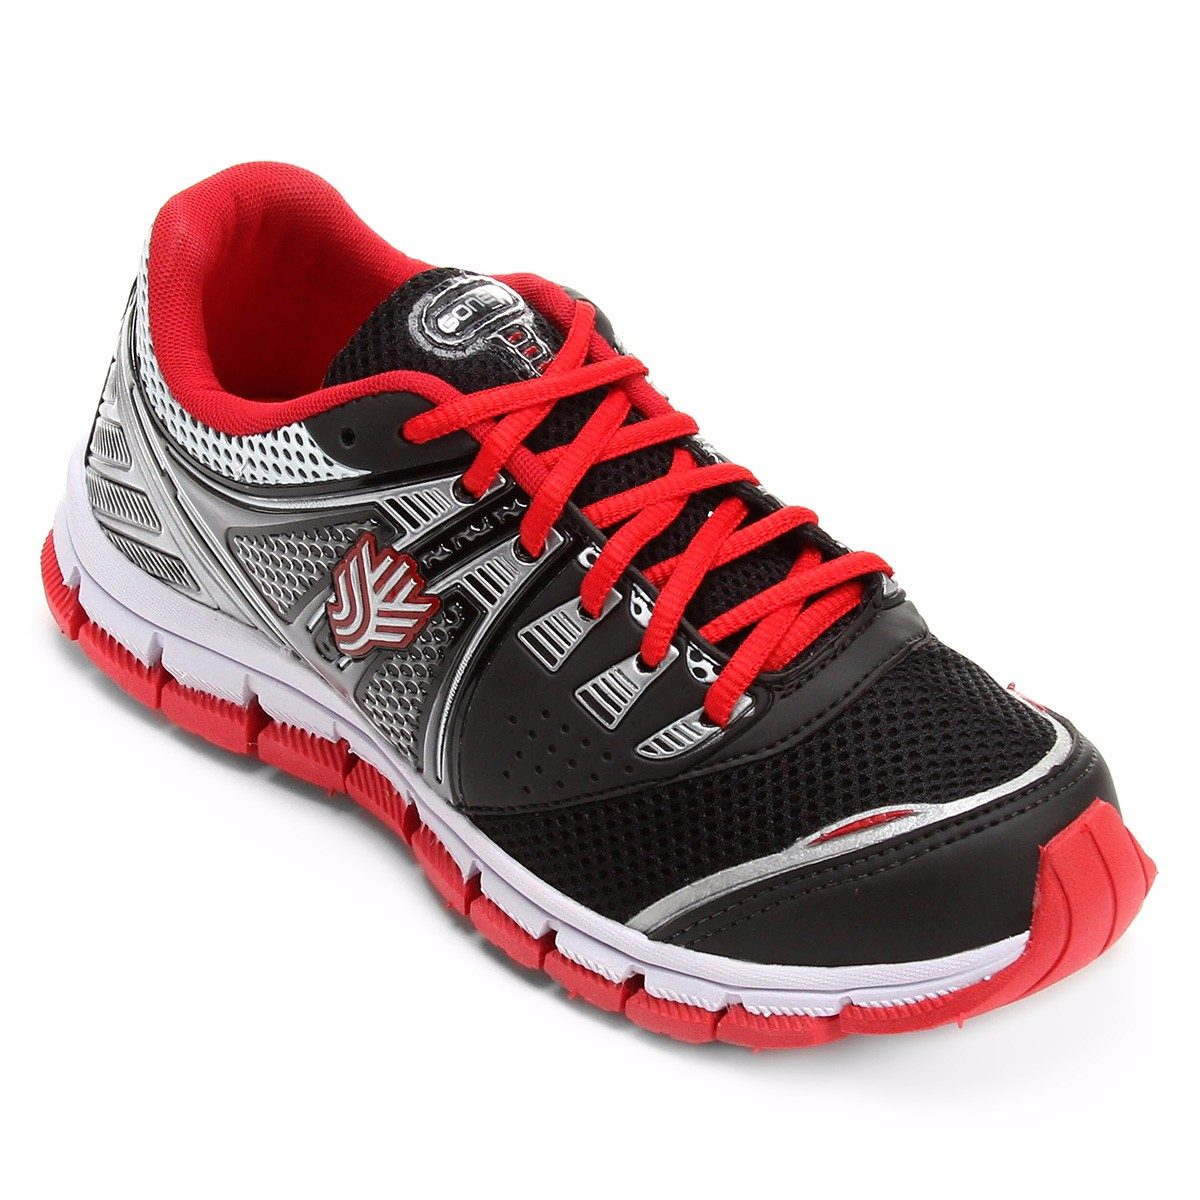 ba6f1a17eb5 tênis gonew runner style masculino. Carregando zoom.